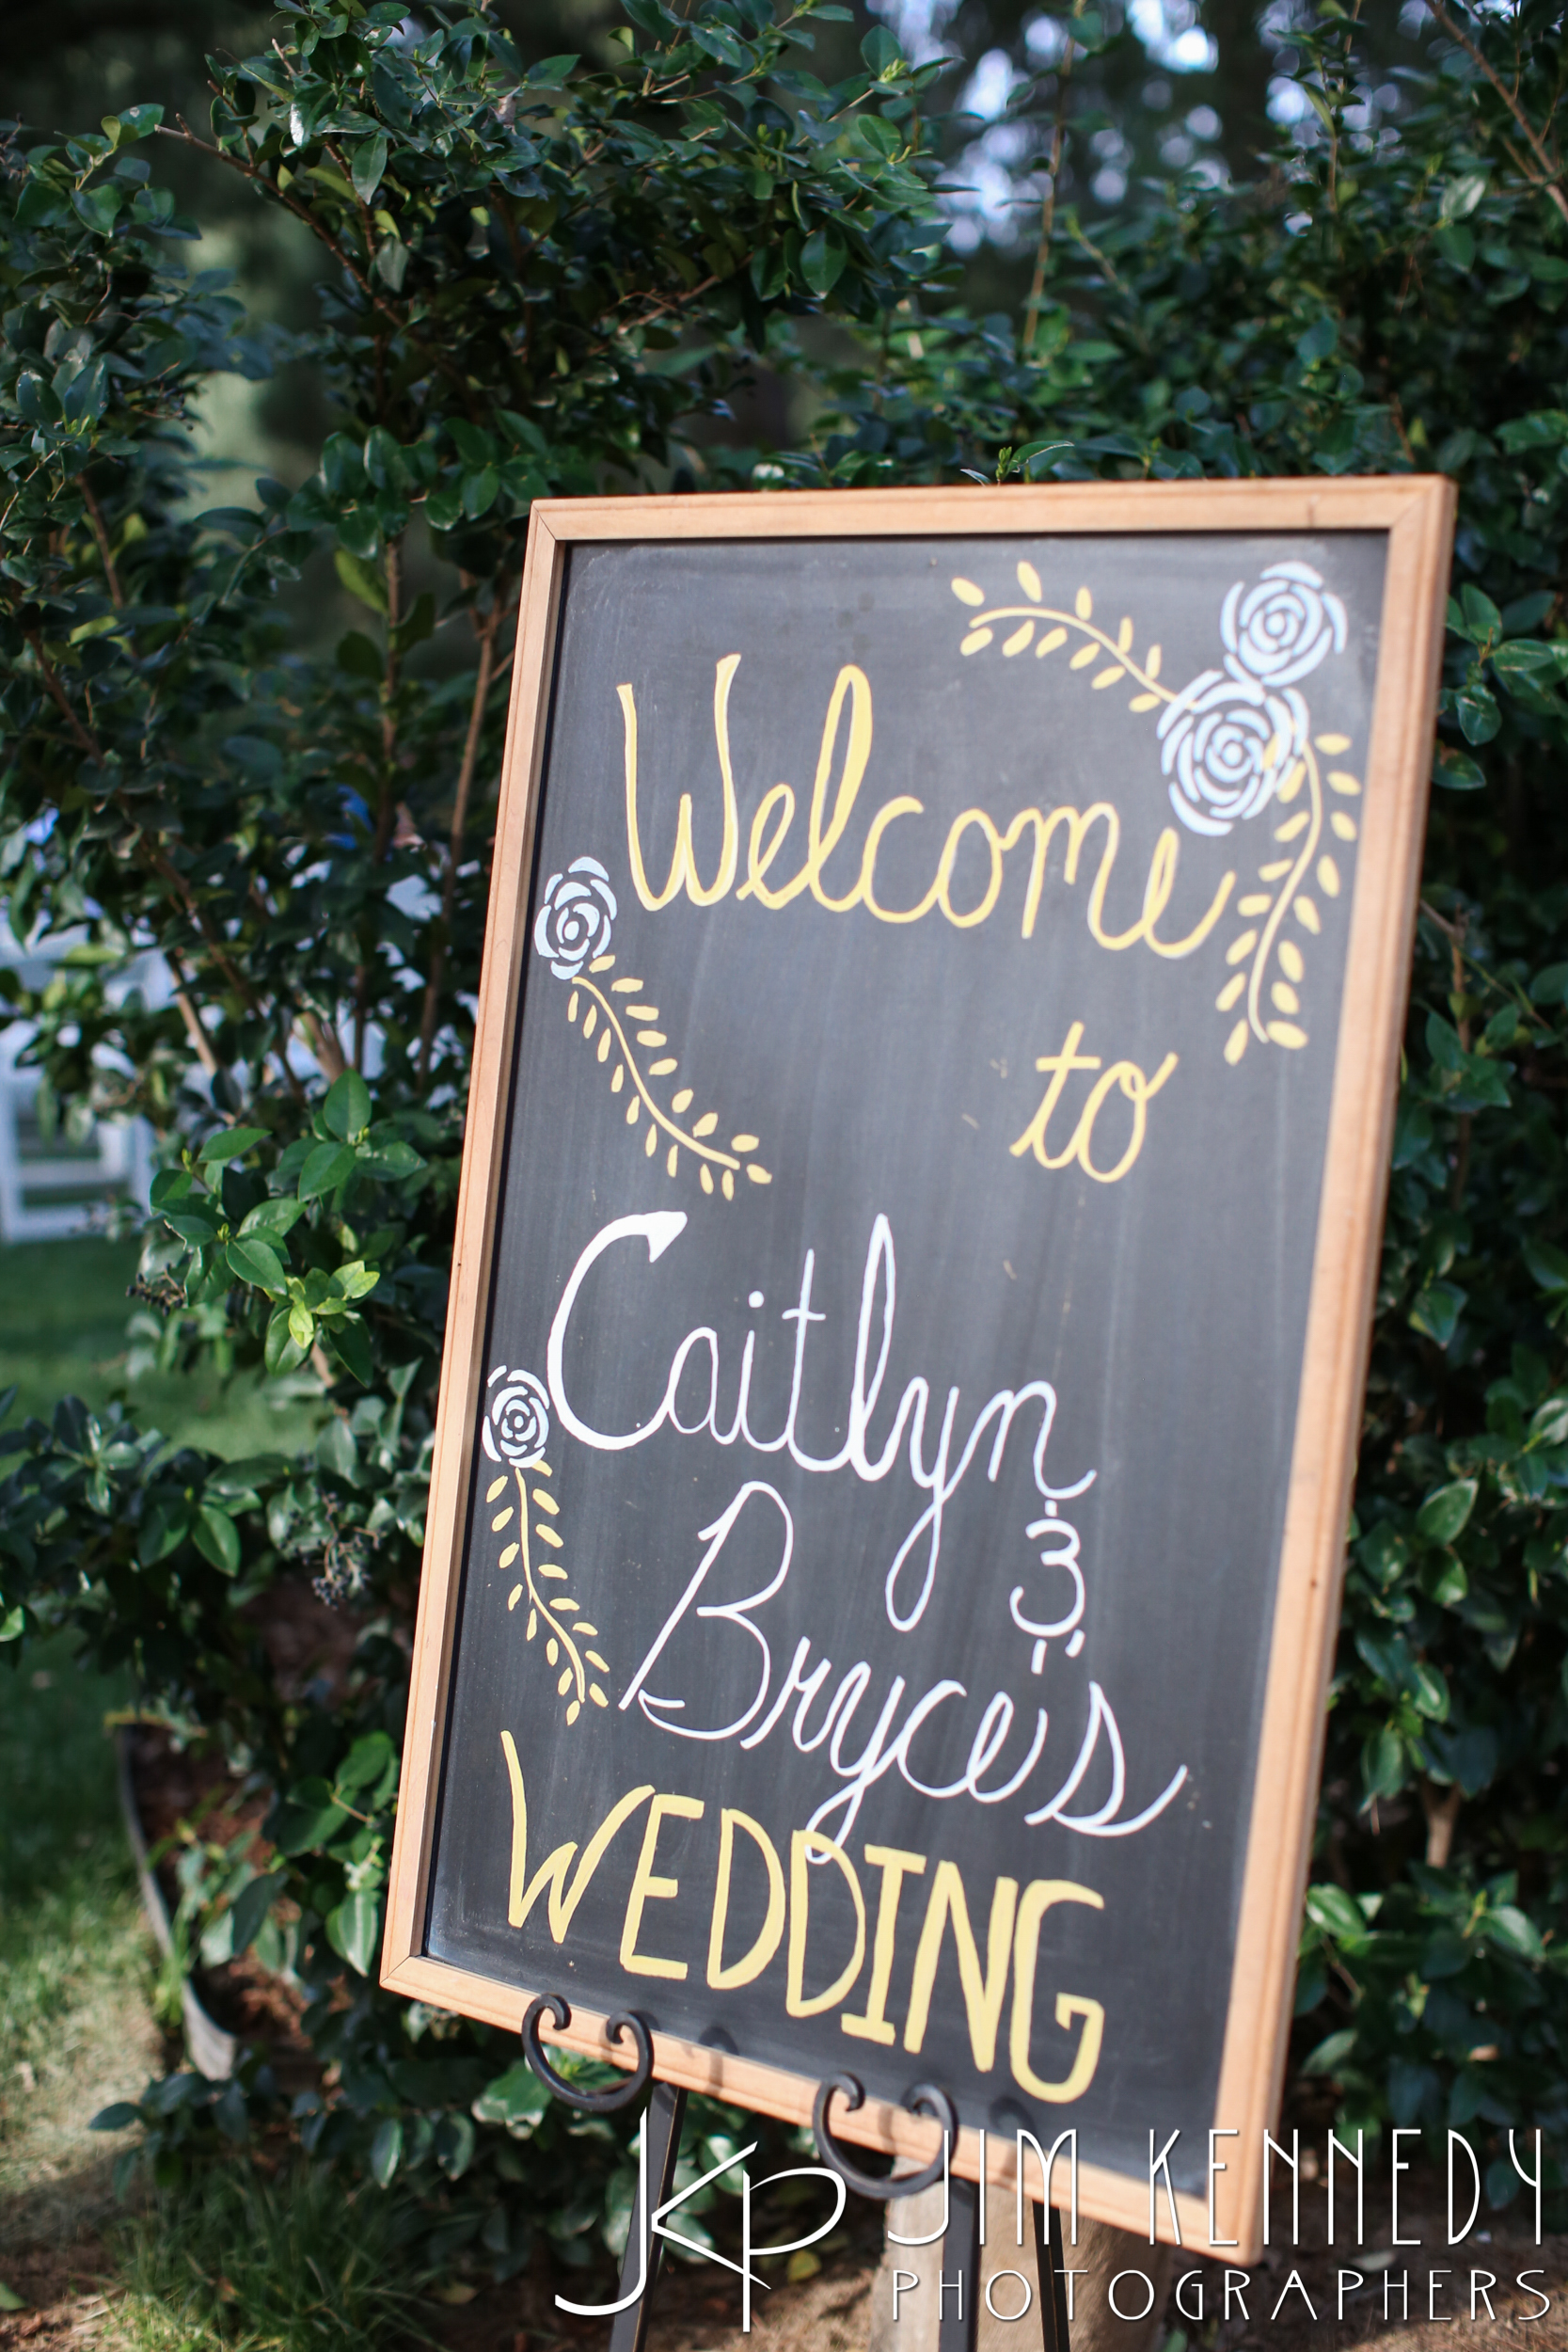 jim_kennedy_photographers_highland_springs_wedding_caitlyn_0096.jpg